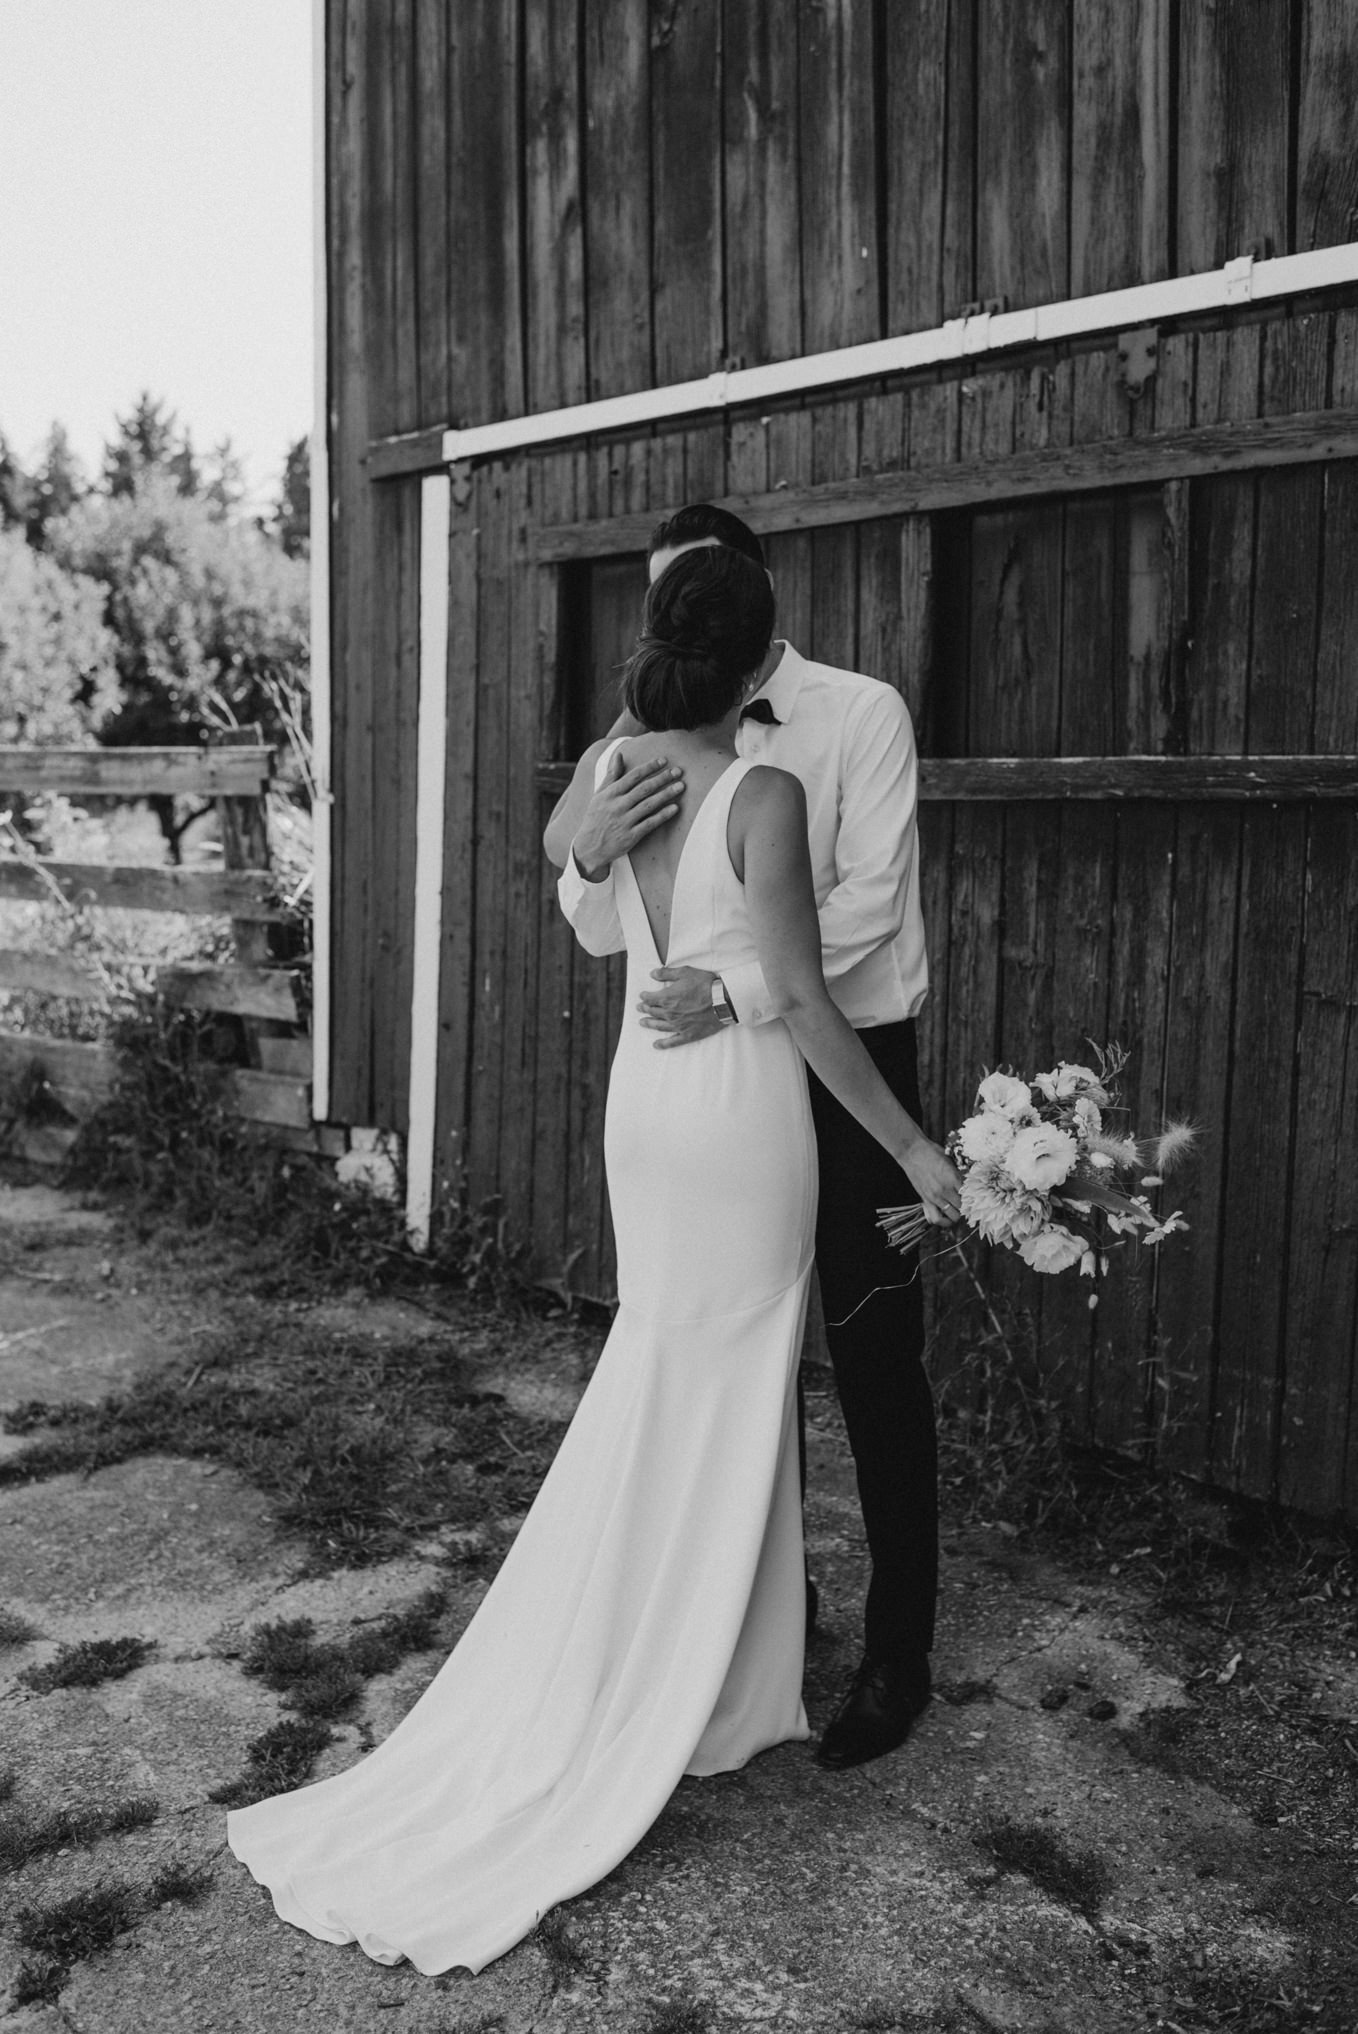 classy bride and groom, fashionable wedding attire